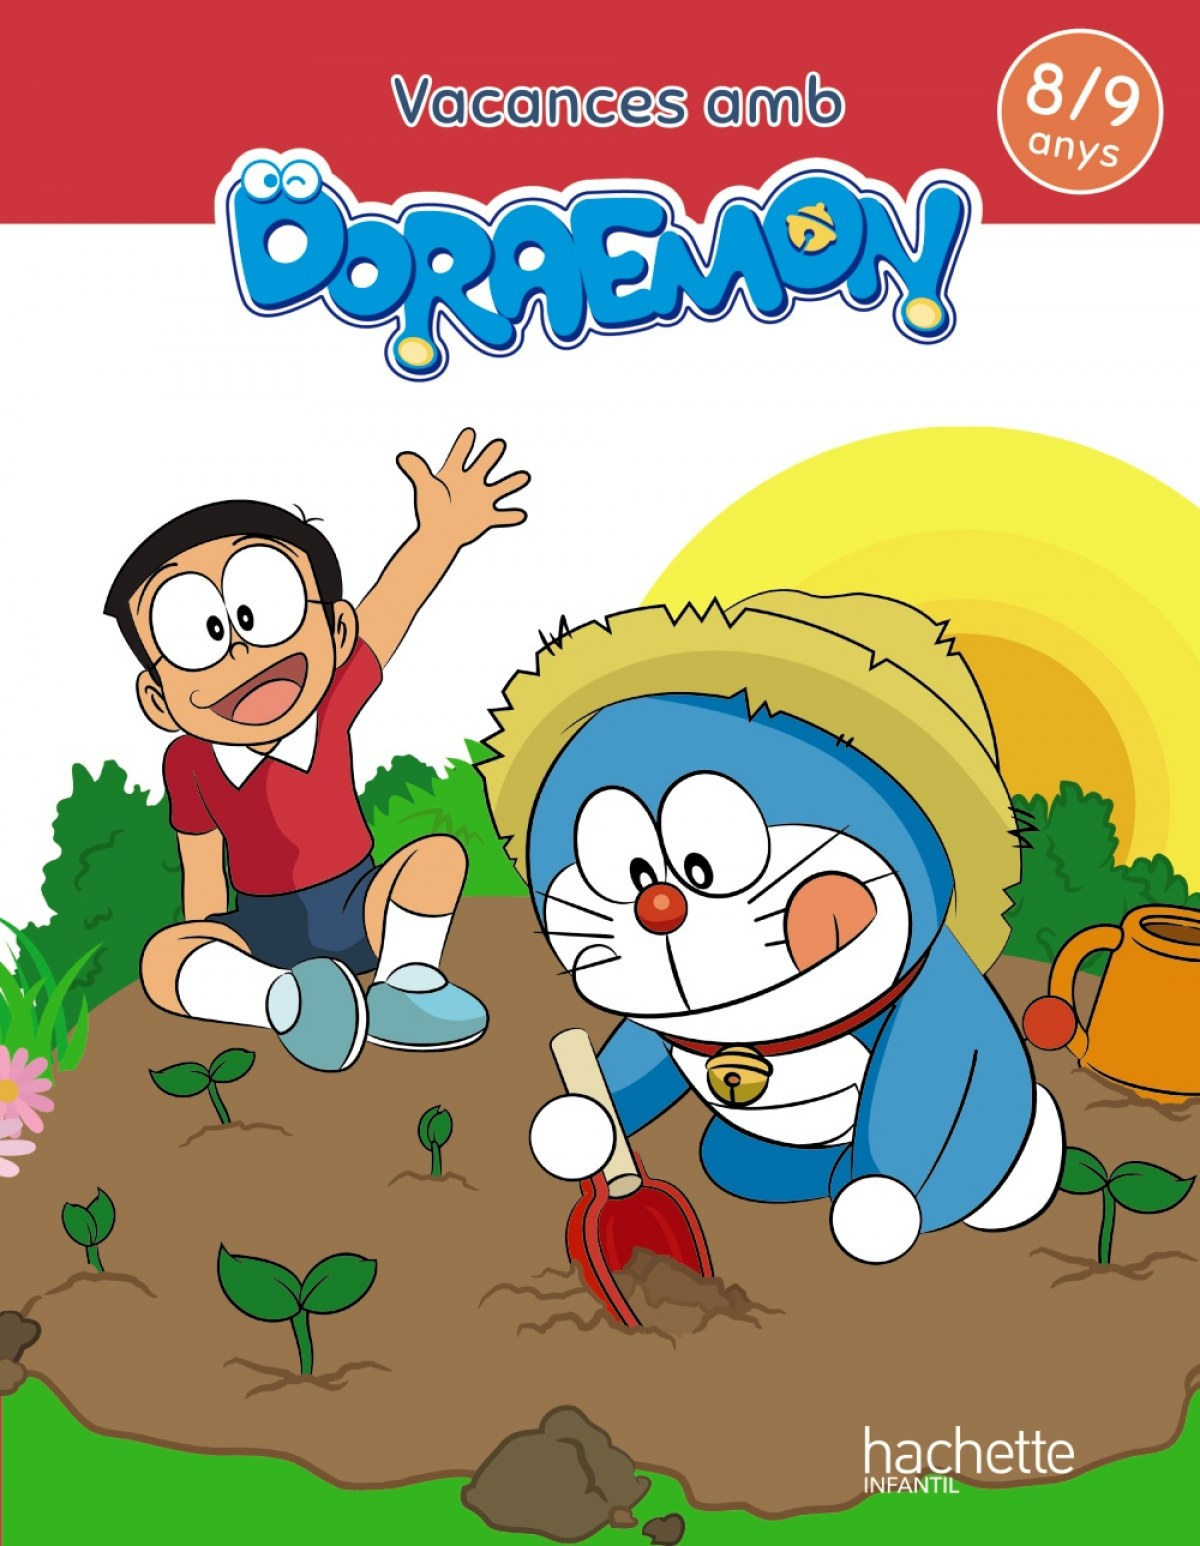 Vacances amb Doraemon 8-9 anys